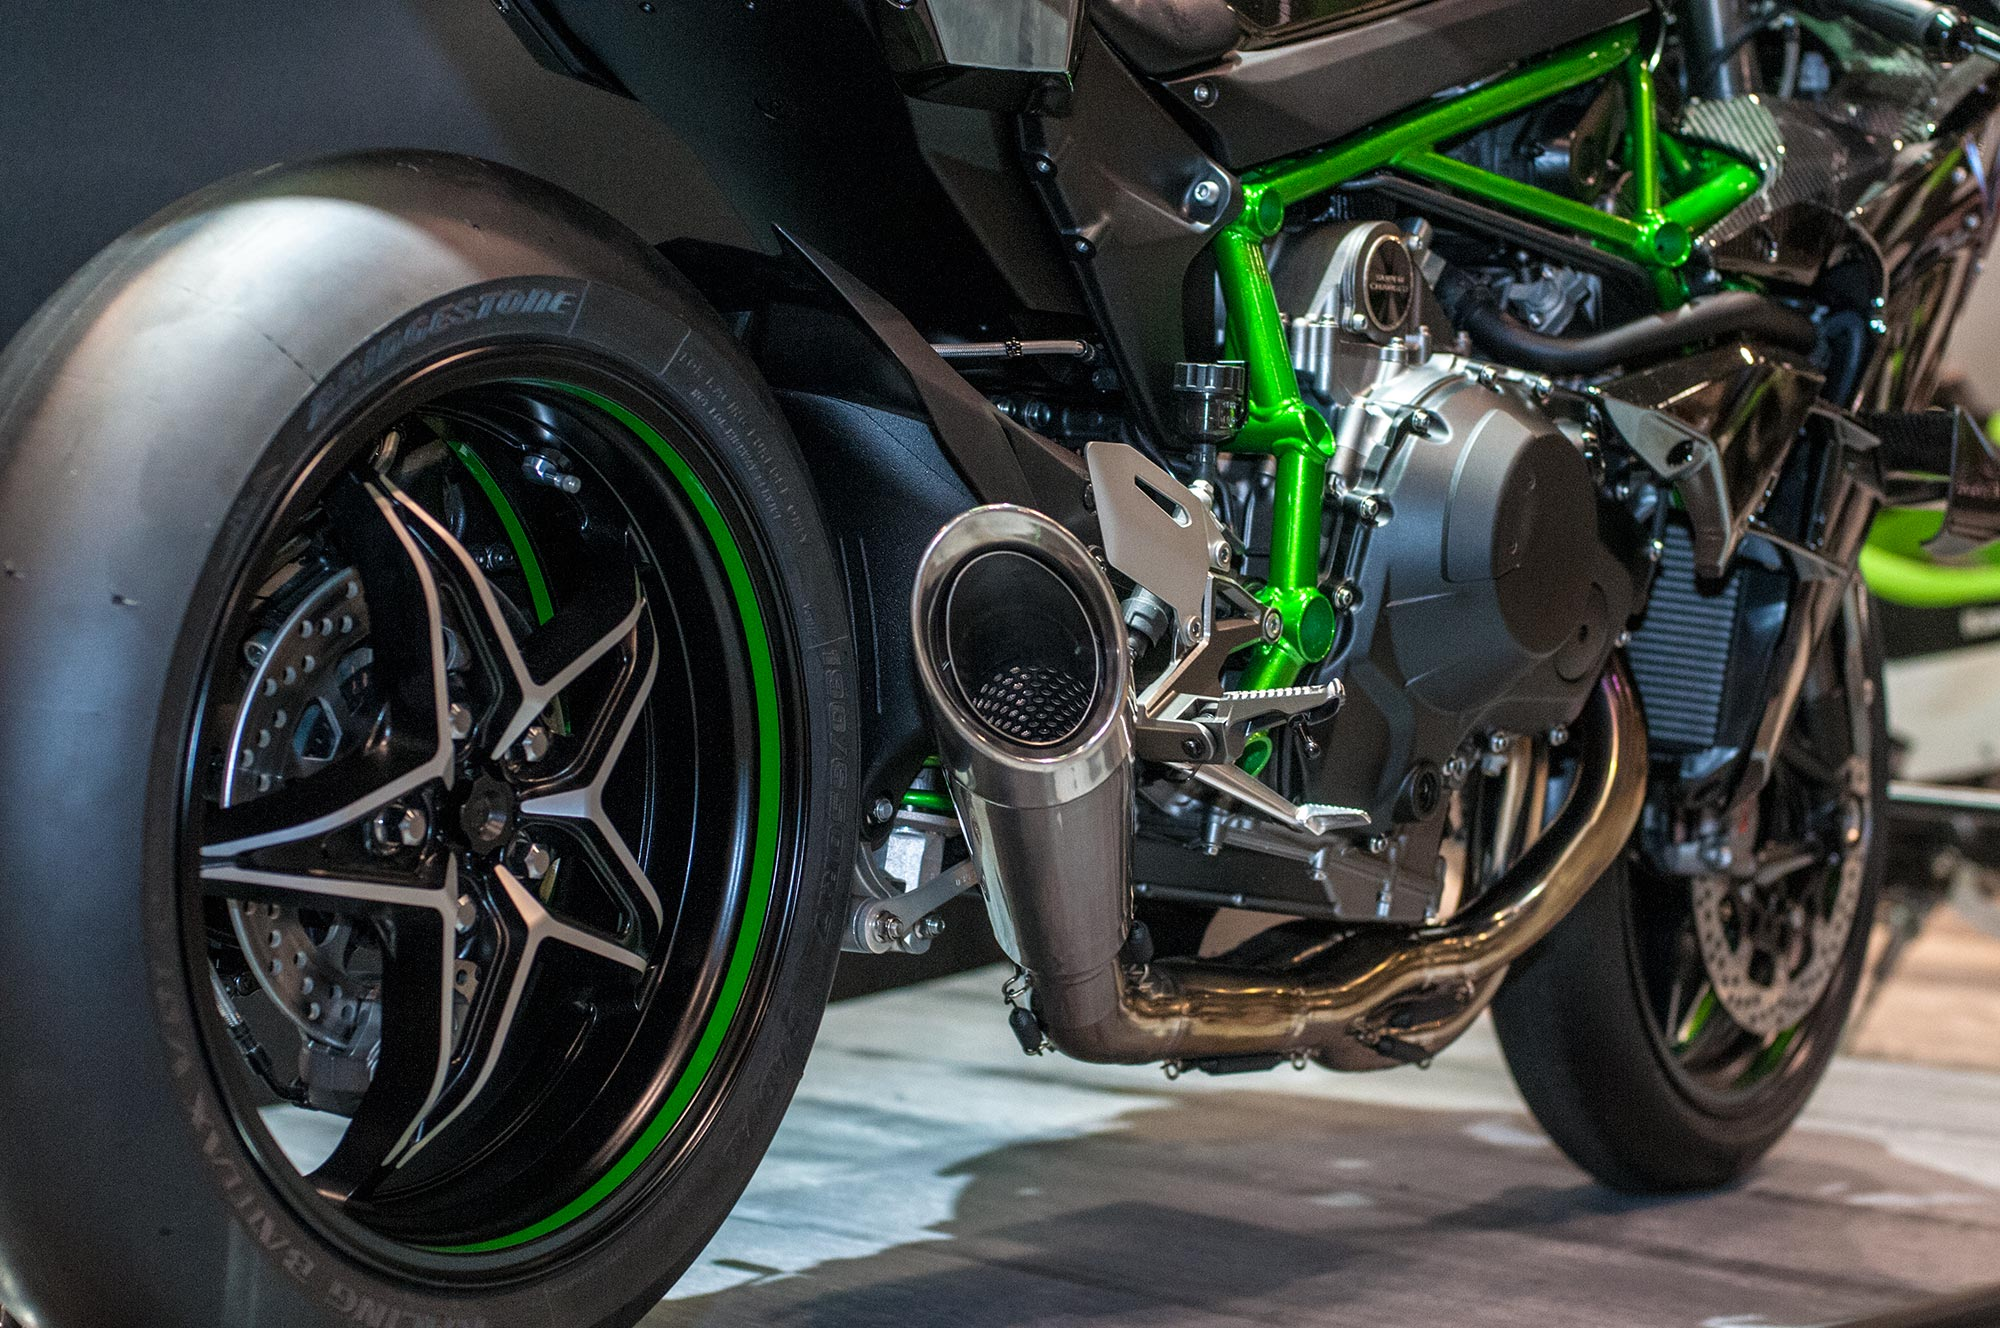 Kawasaki Ninja H2r Streetfighter Concept By Ad Koncept Asphalt